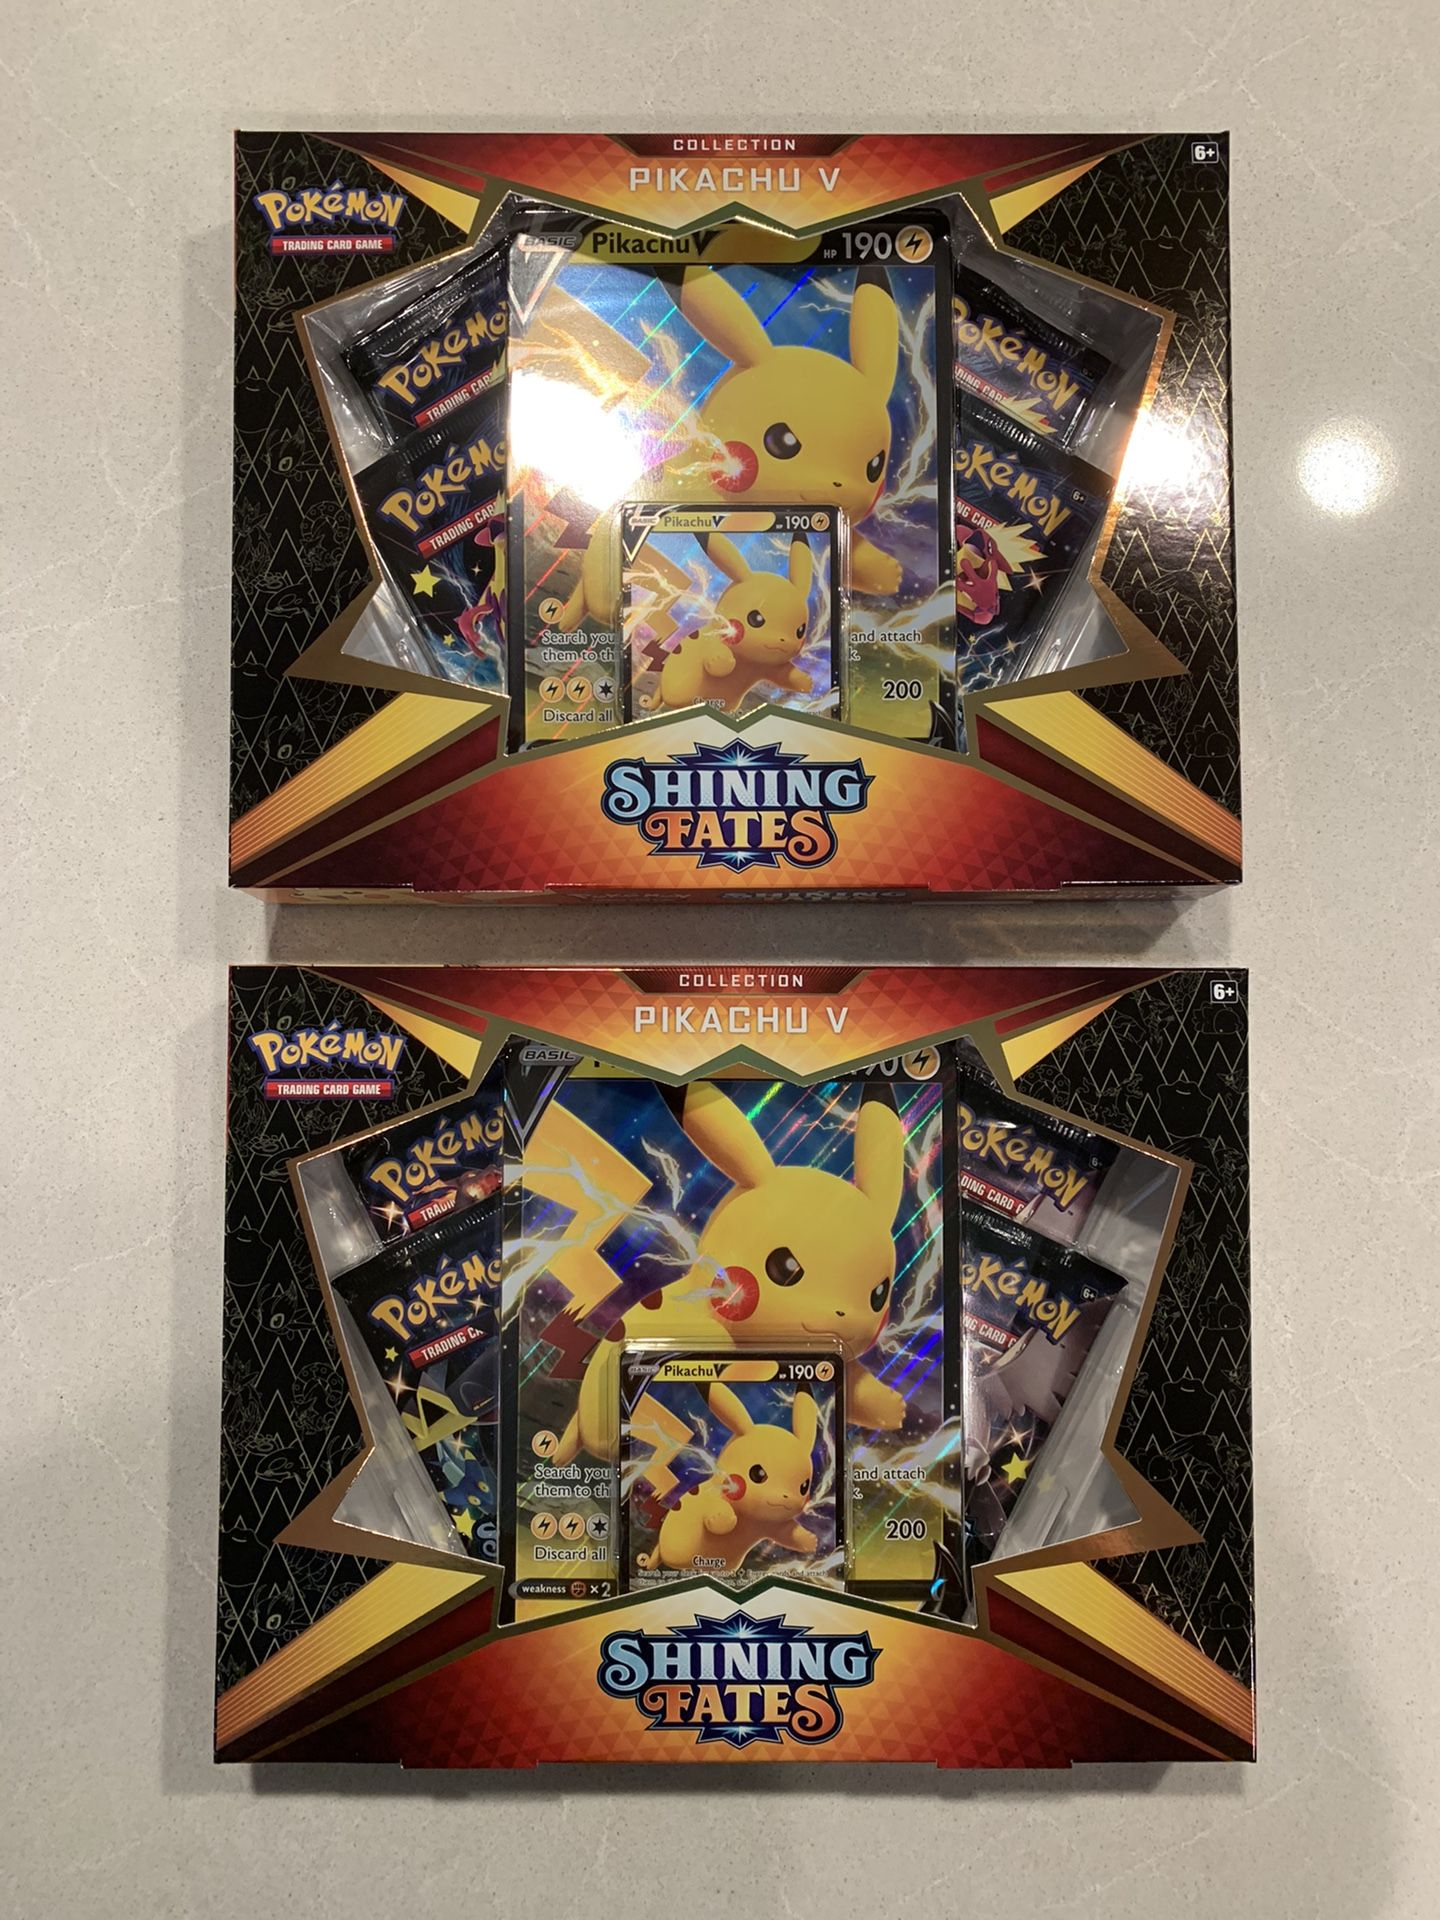 Pokémon TCG Shining Fates Pikachu V boxsets *SEALED* Pokemon Gigantamax Charizard Card Game